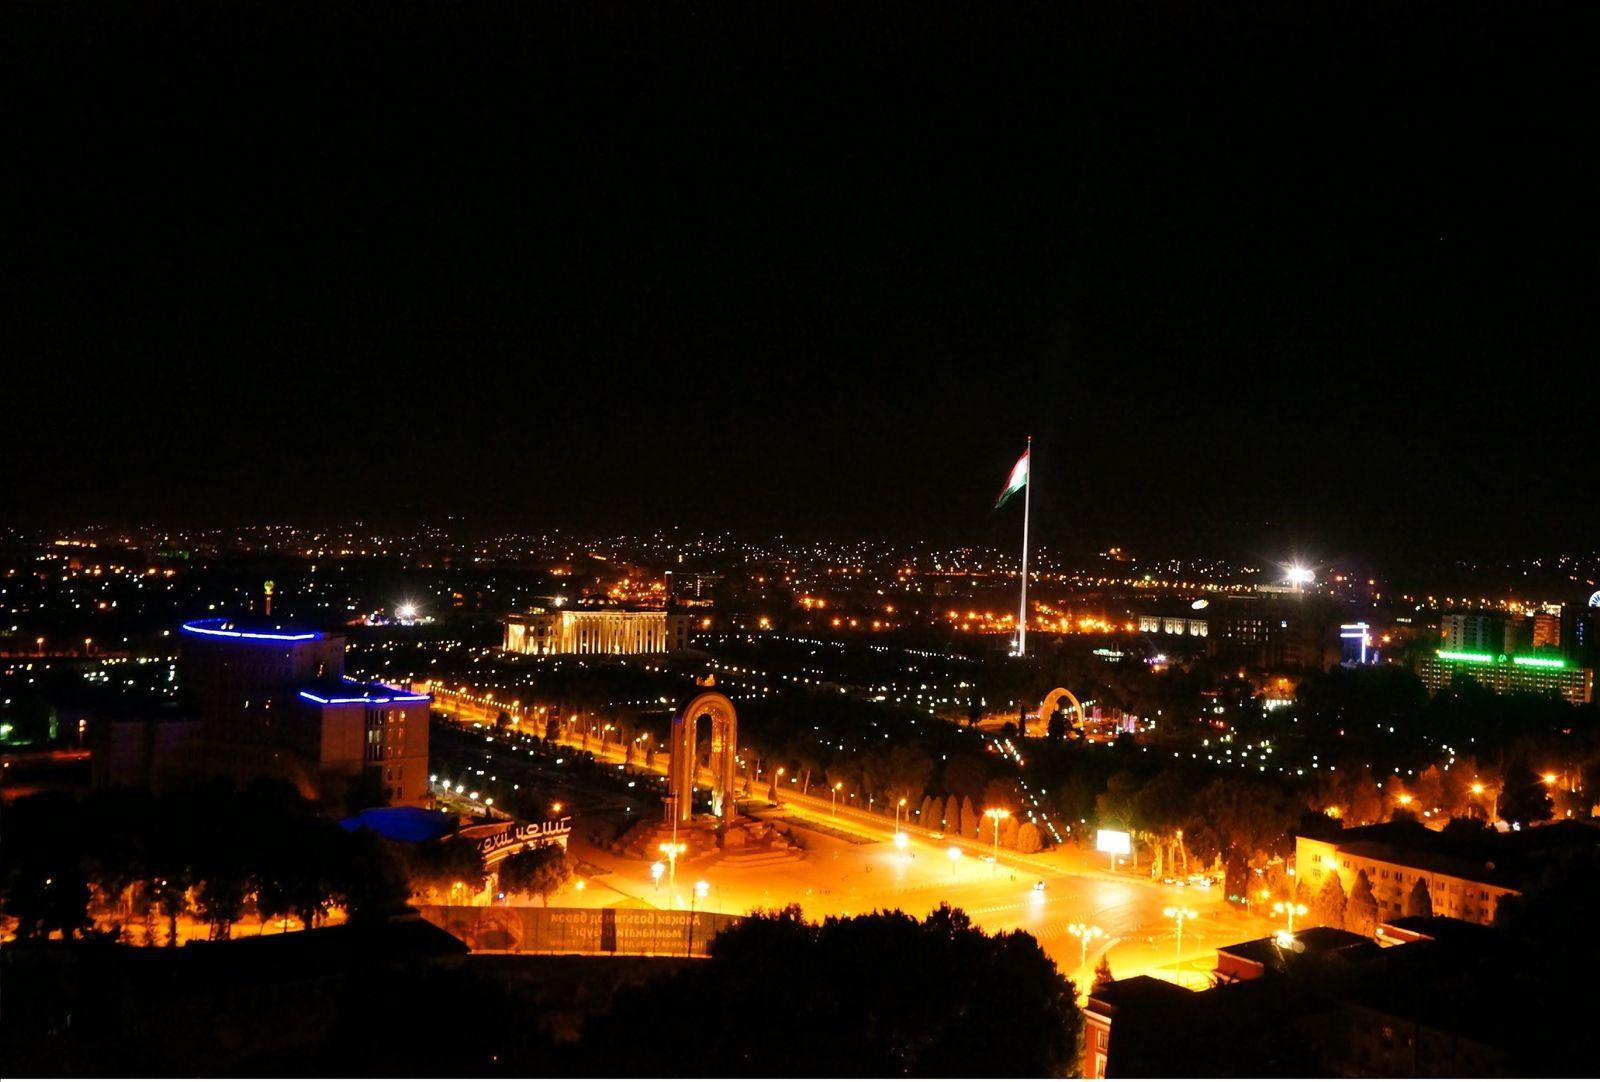 Вся страна кроме ГБАО осталась без света— Авария вТаджикистане